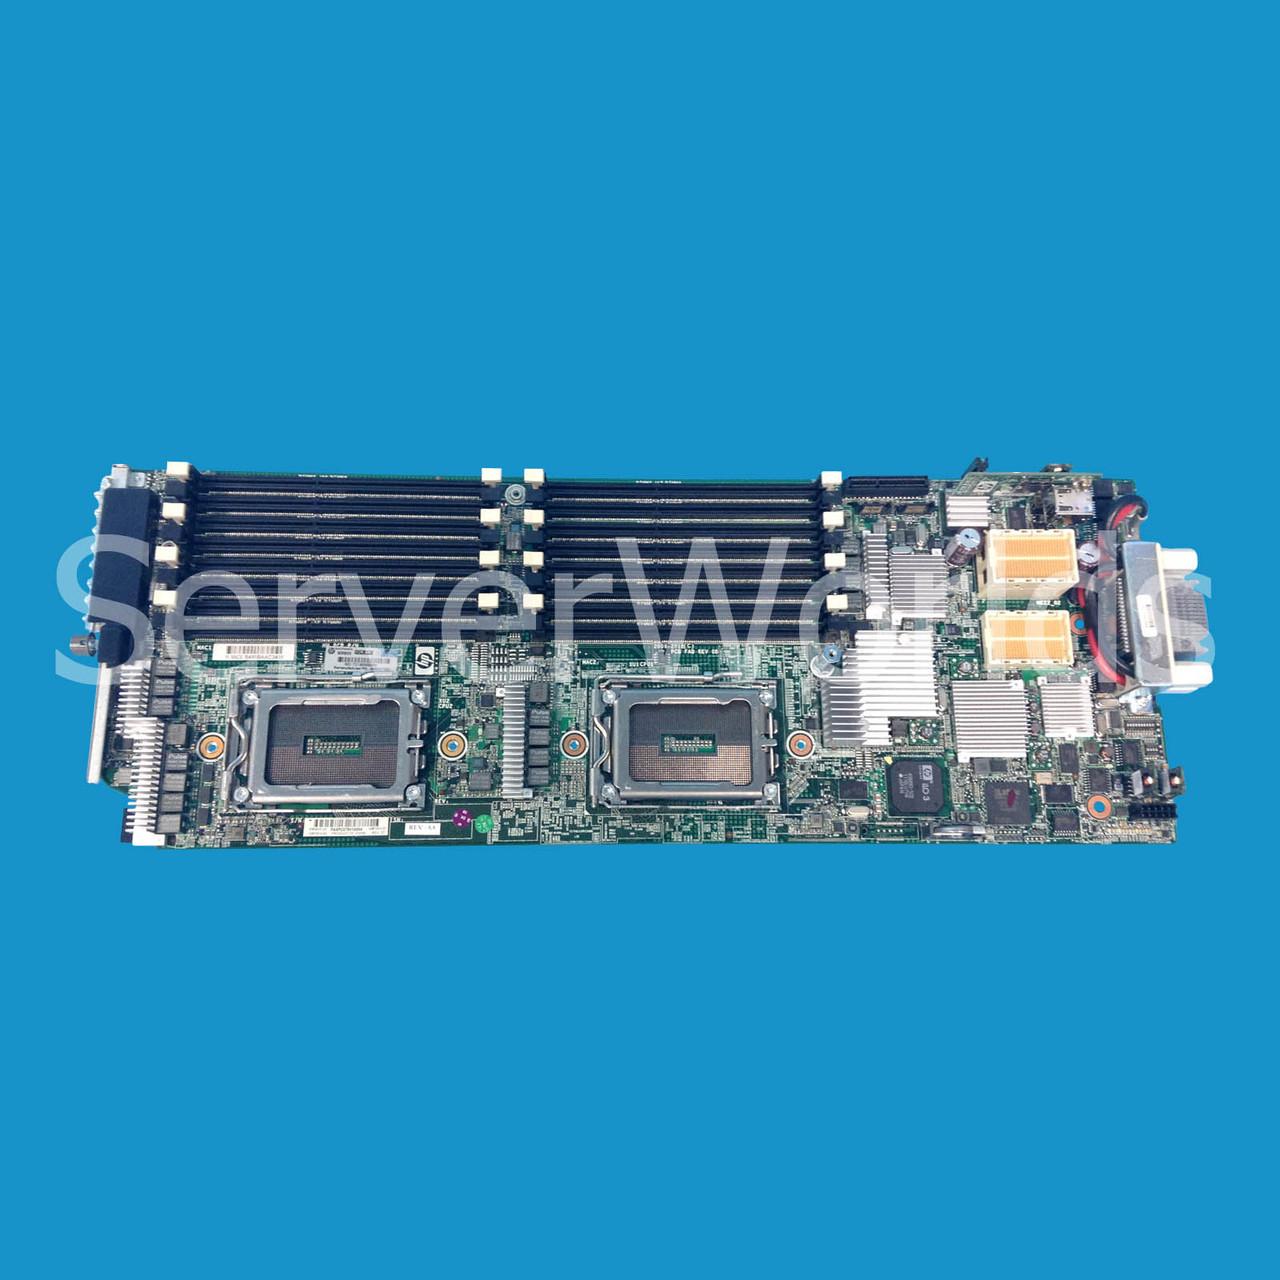 HP 598247-001 | BL465C G7 System Board | HP 578814-001